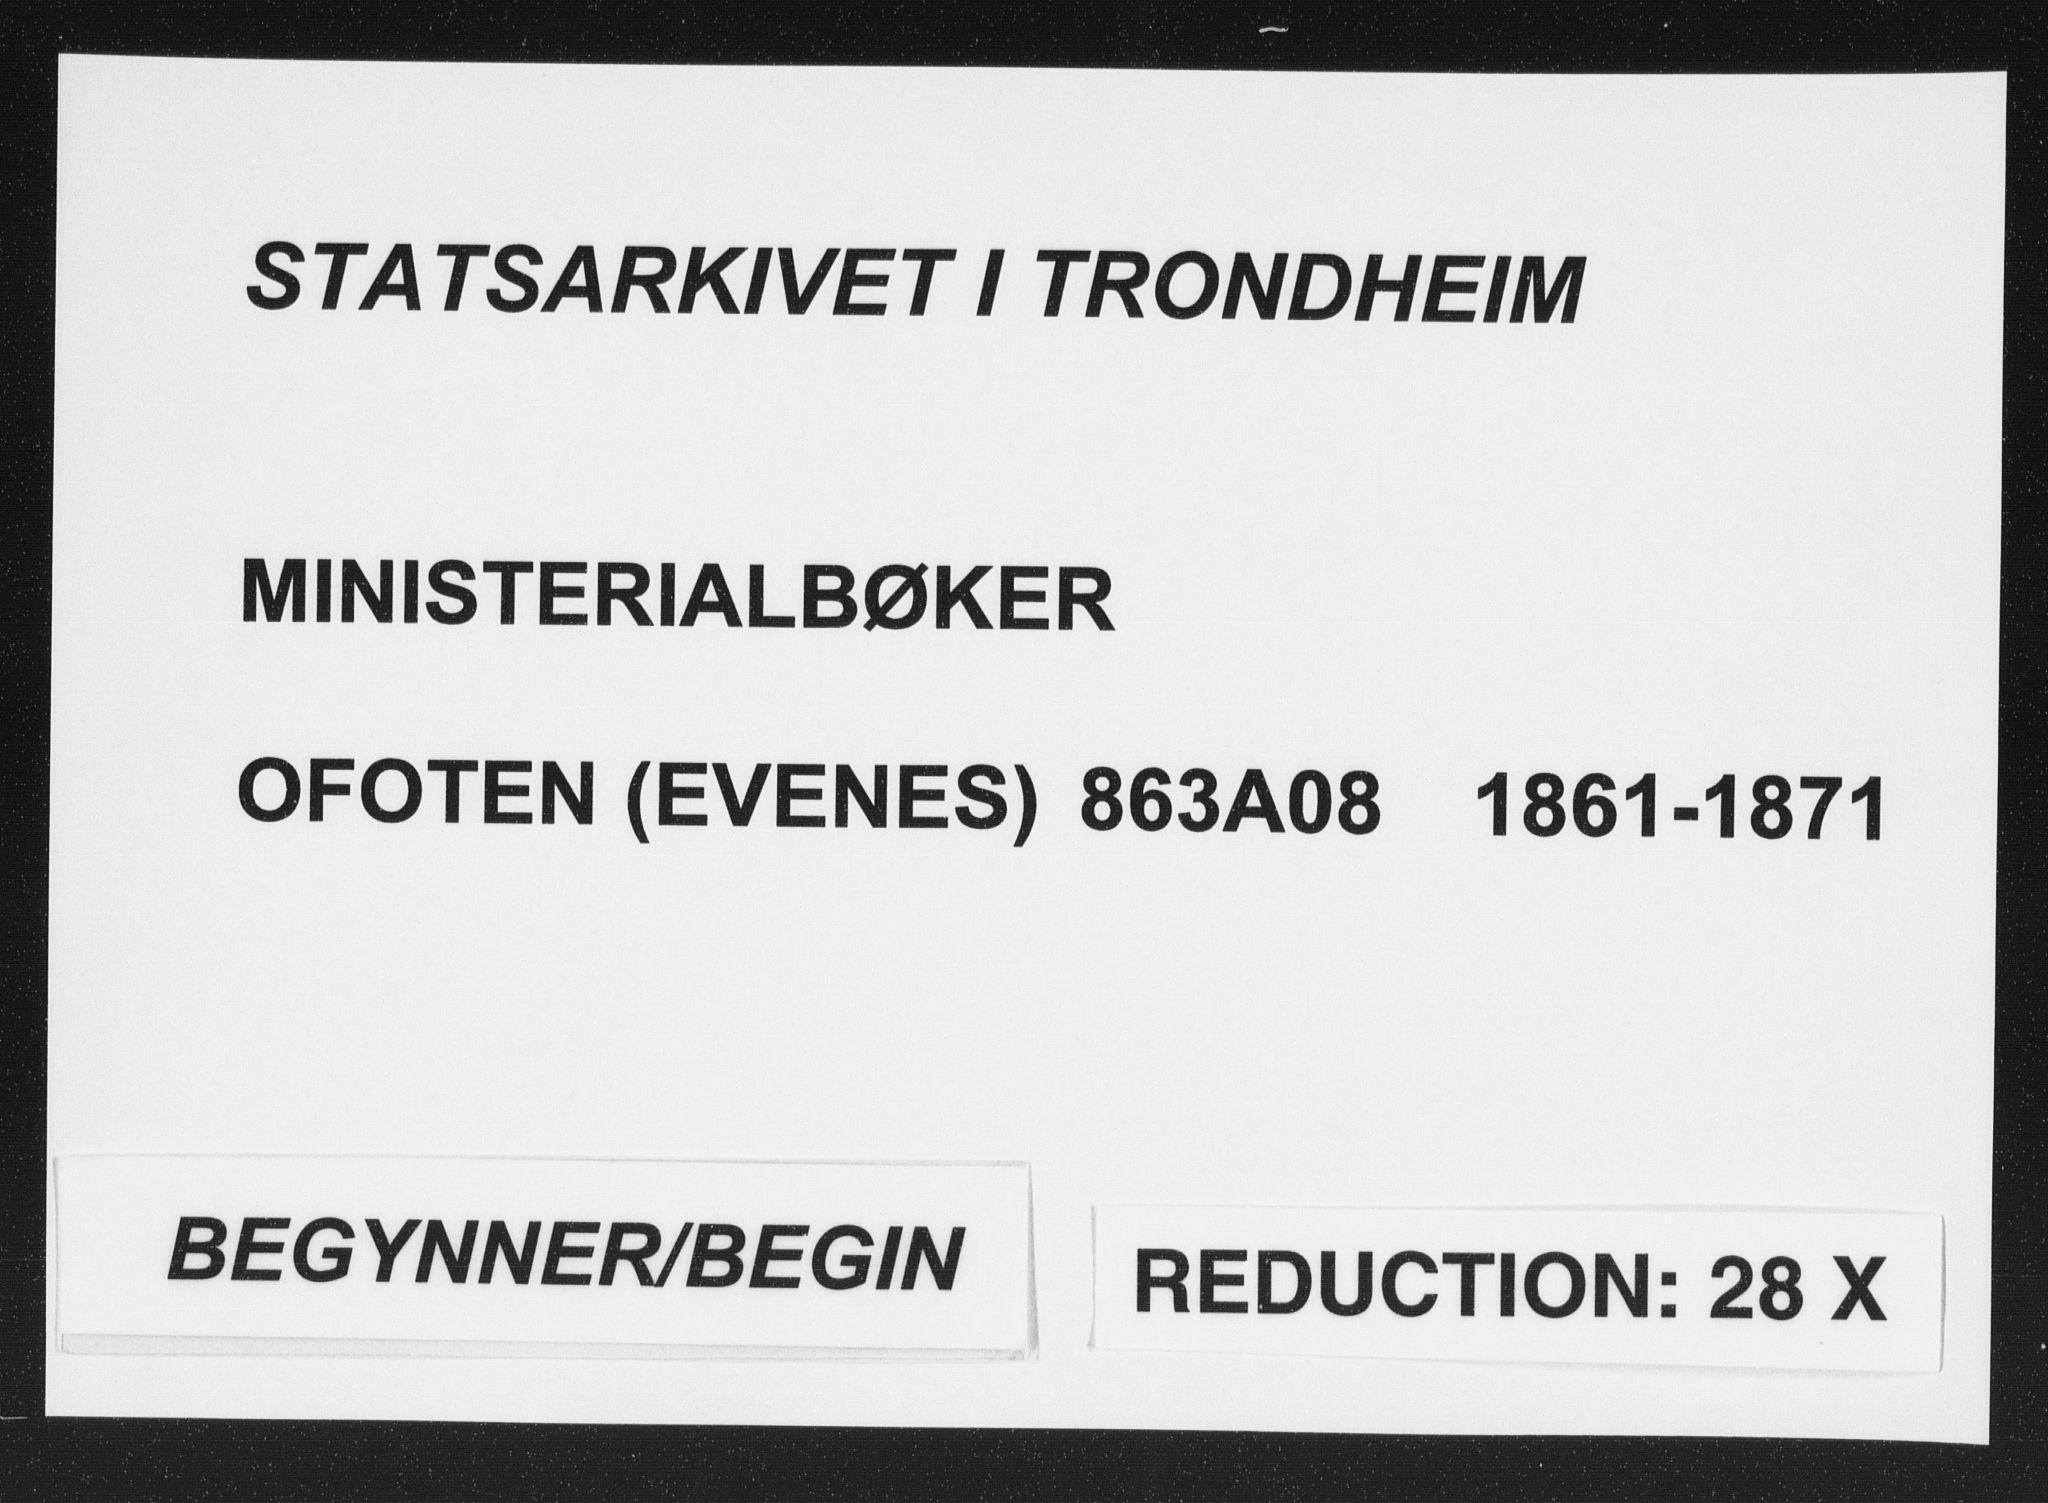 SAT, Ministerialprotokoller, klokkerbøker og fødselsregistre - Nordland, 863/L0896: Ministerialbok nr. 863A08, 1861-1871